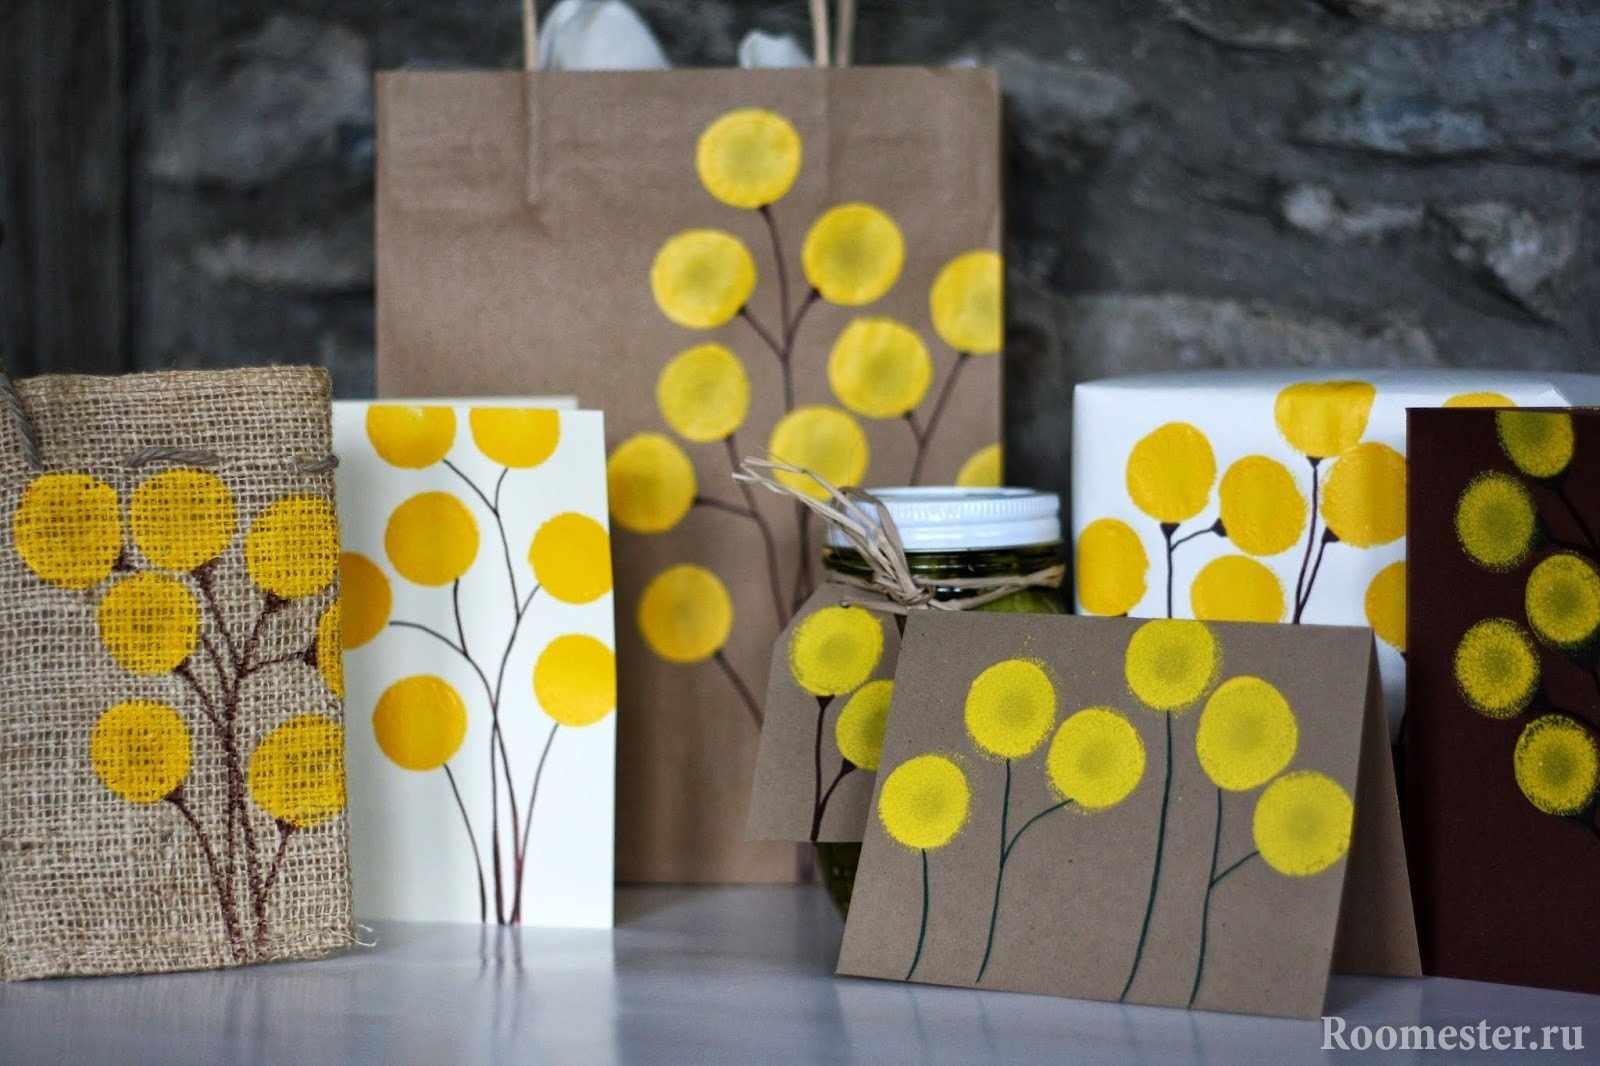 Декор конвертов, пакетов, банок